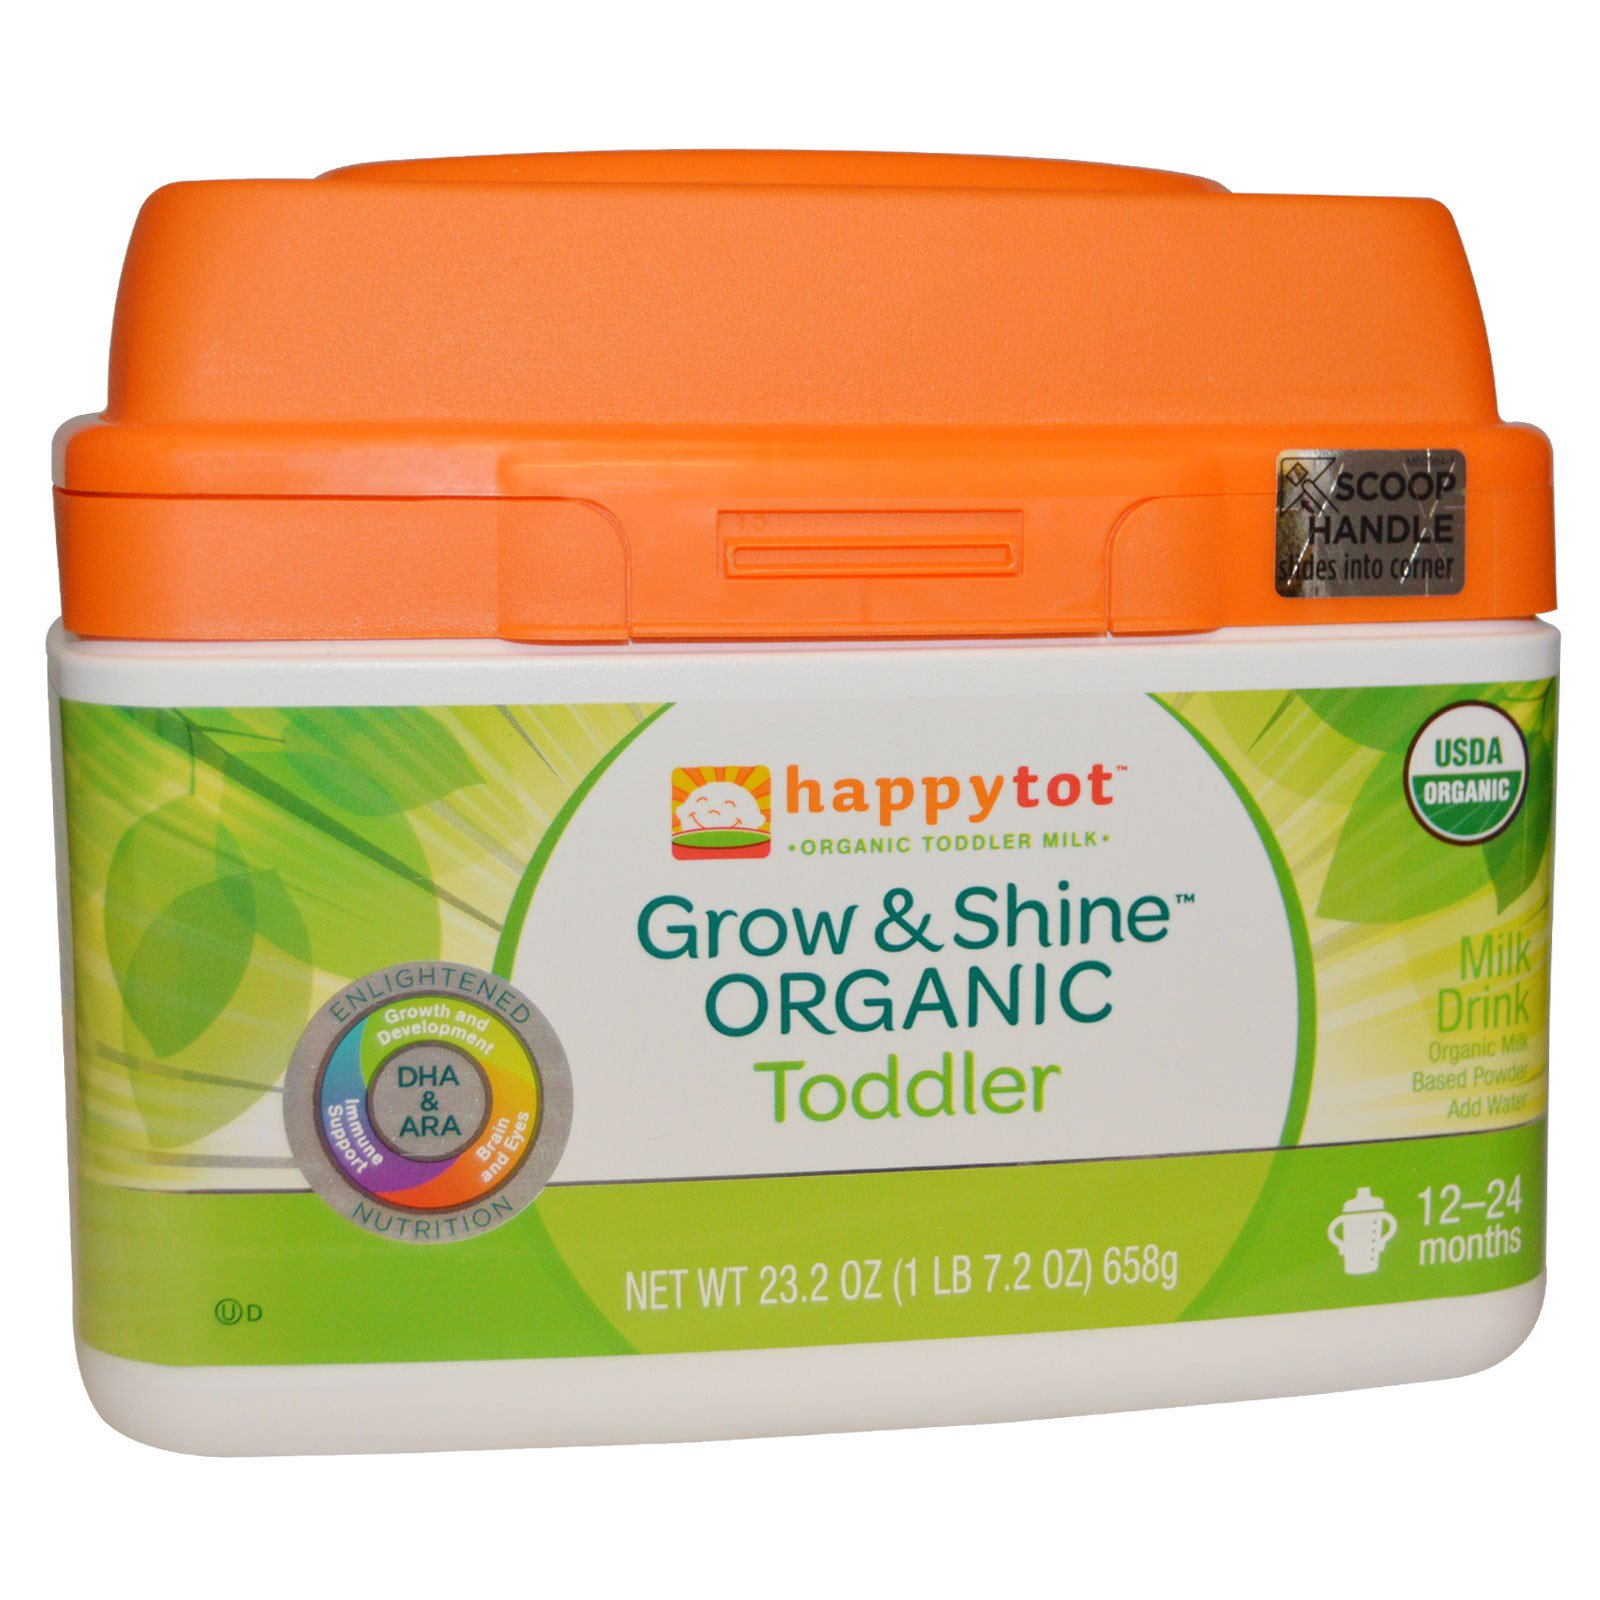 Nurture Inc Happy Baby Happytot Organic Milk Based Powder Grow